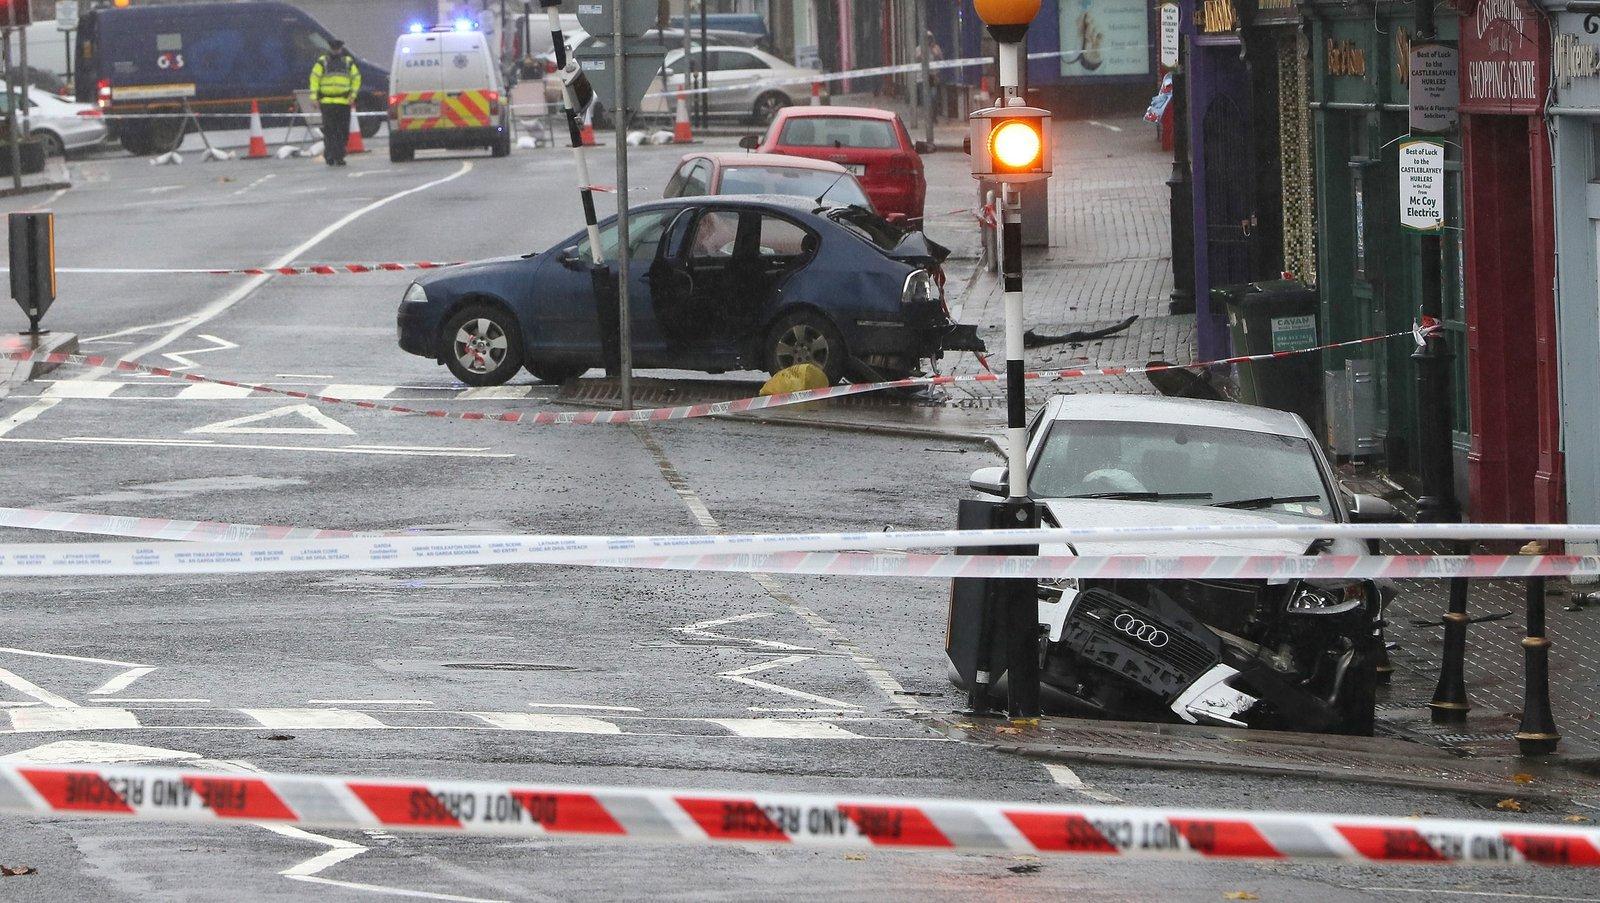 investigation under way into fatal monaghan road crash